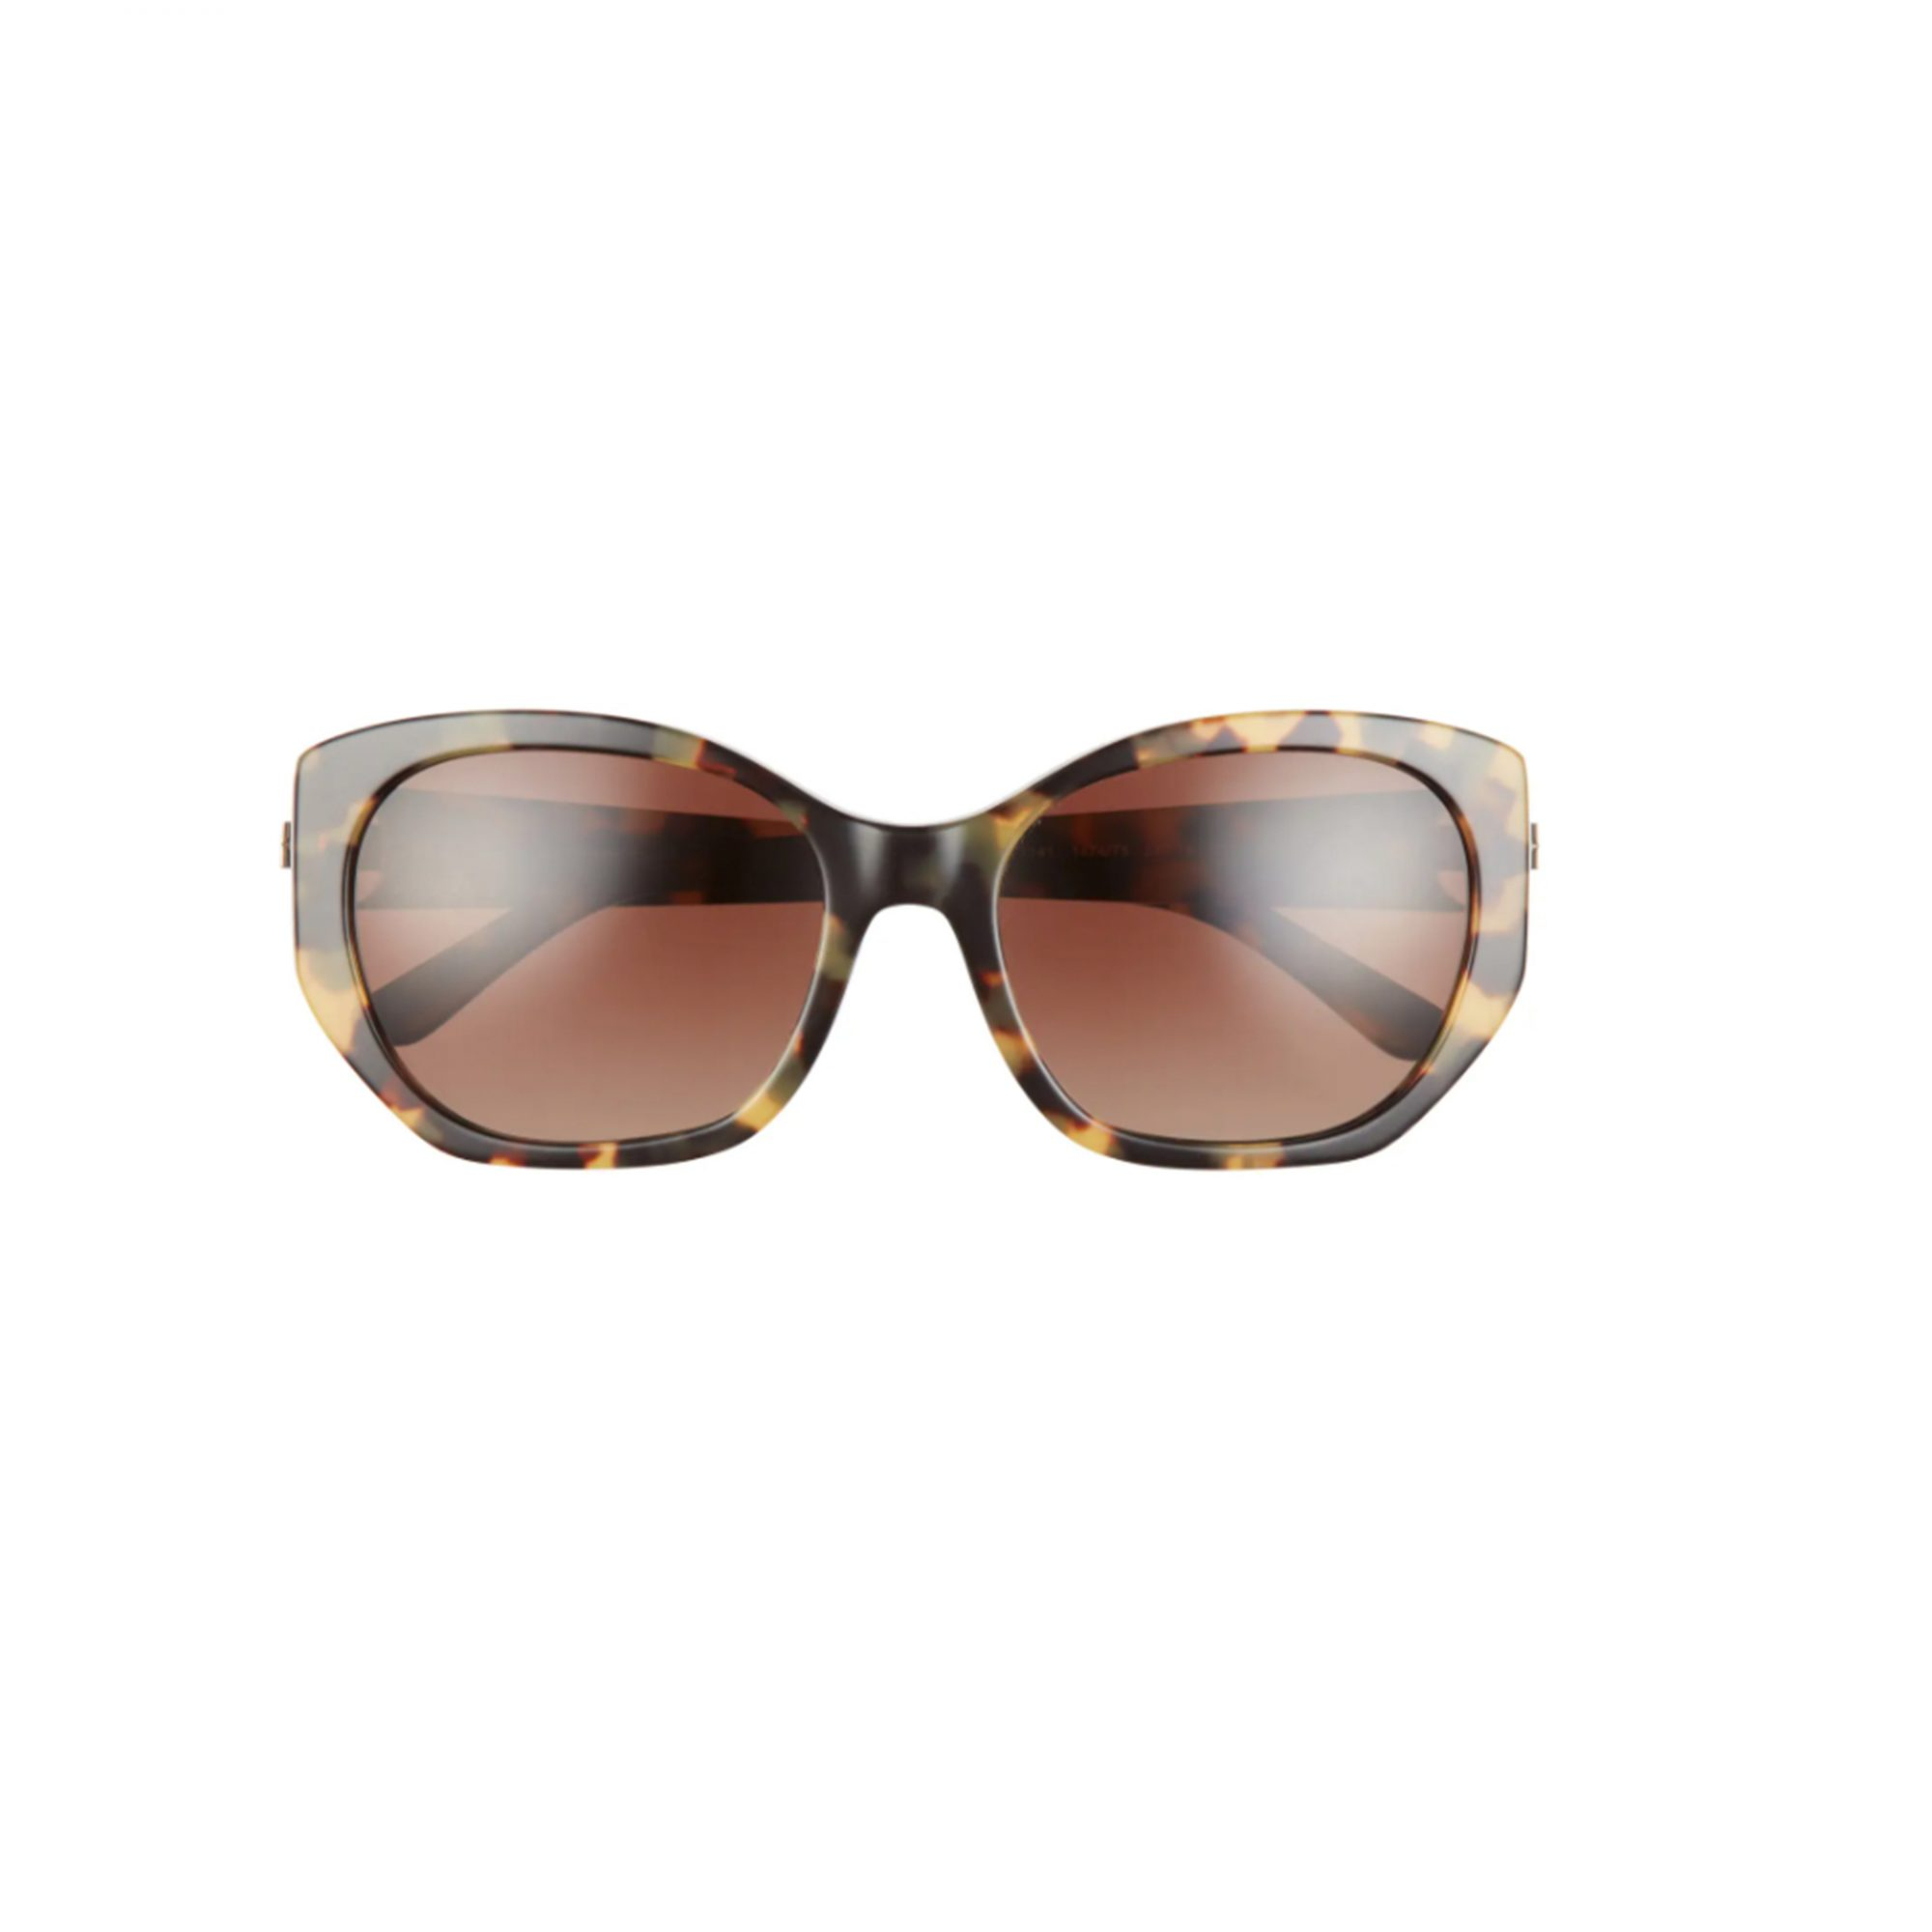 tory-burch-oval-sunglasses